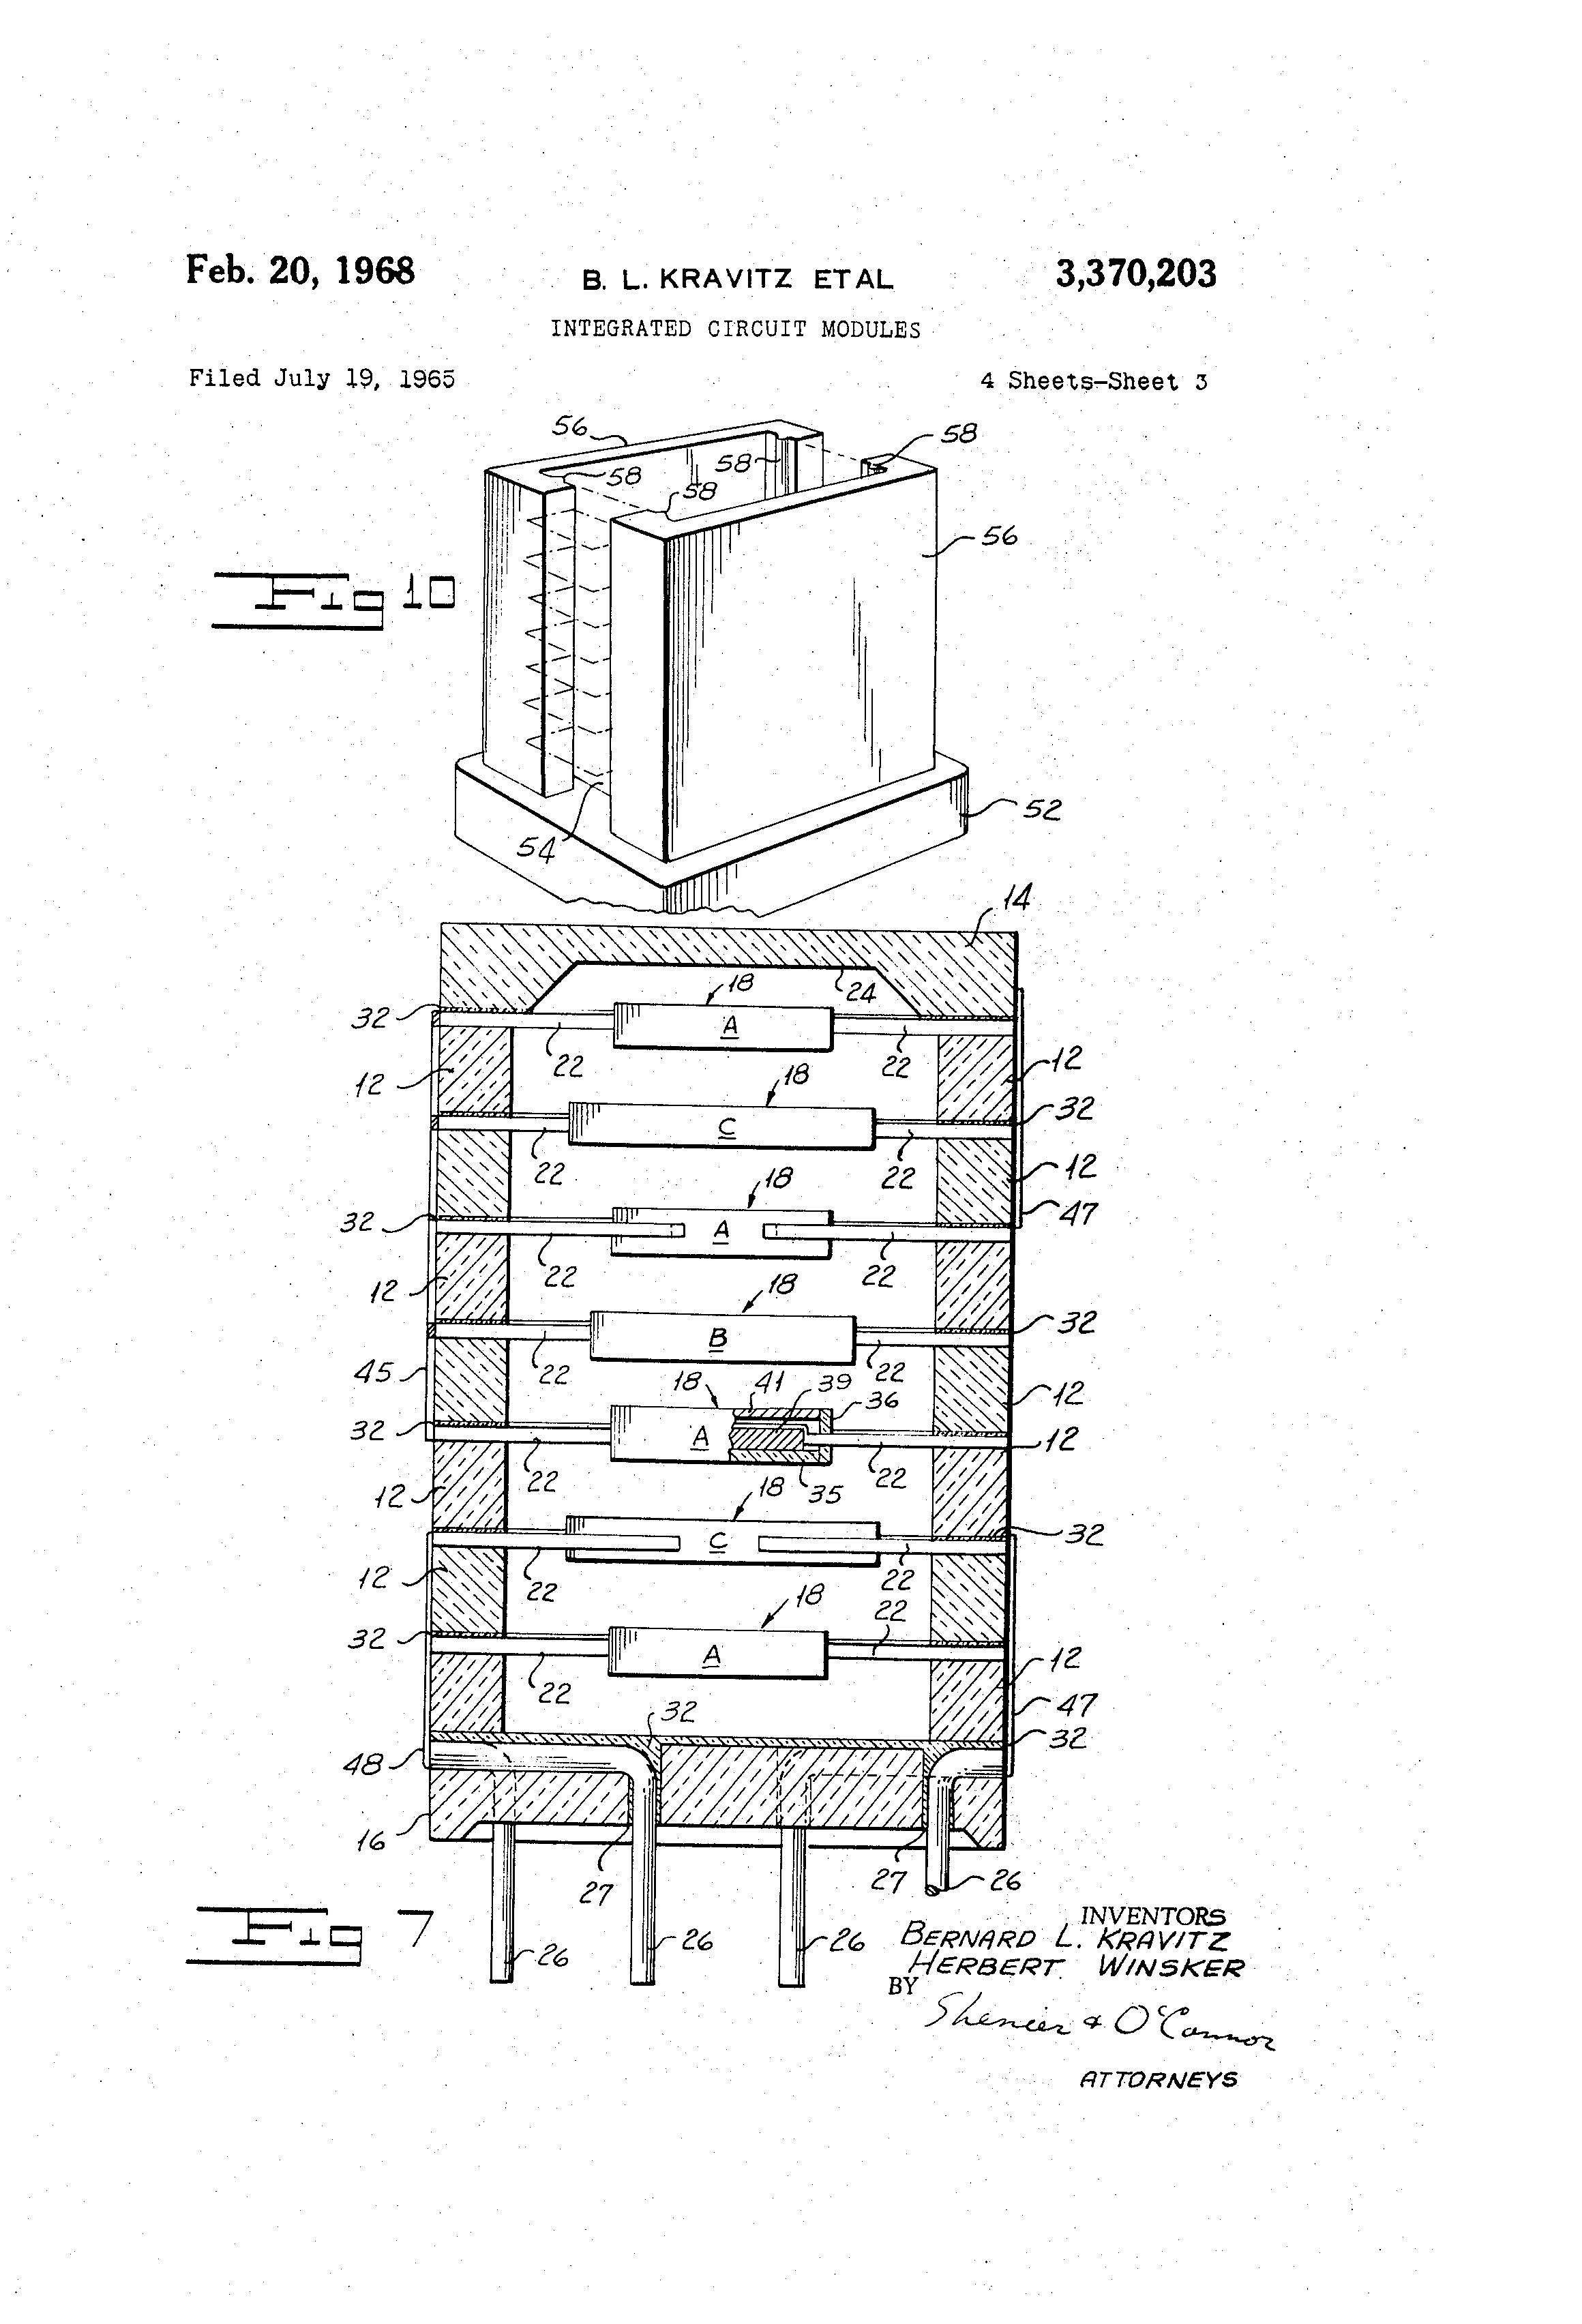 patente us3370203 - integrated circuit modules